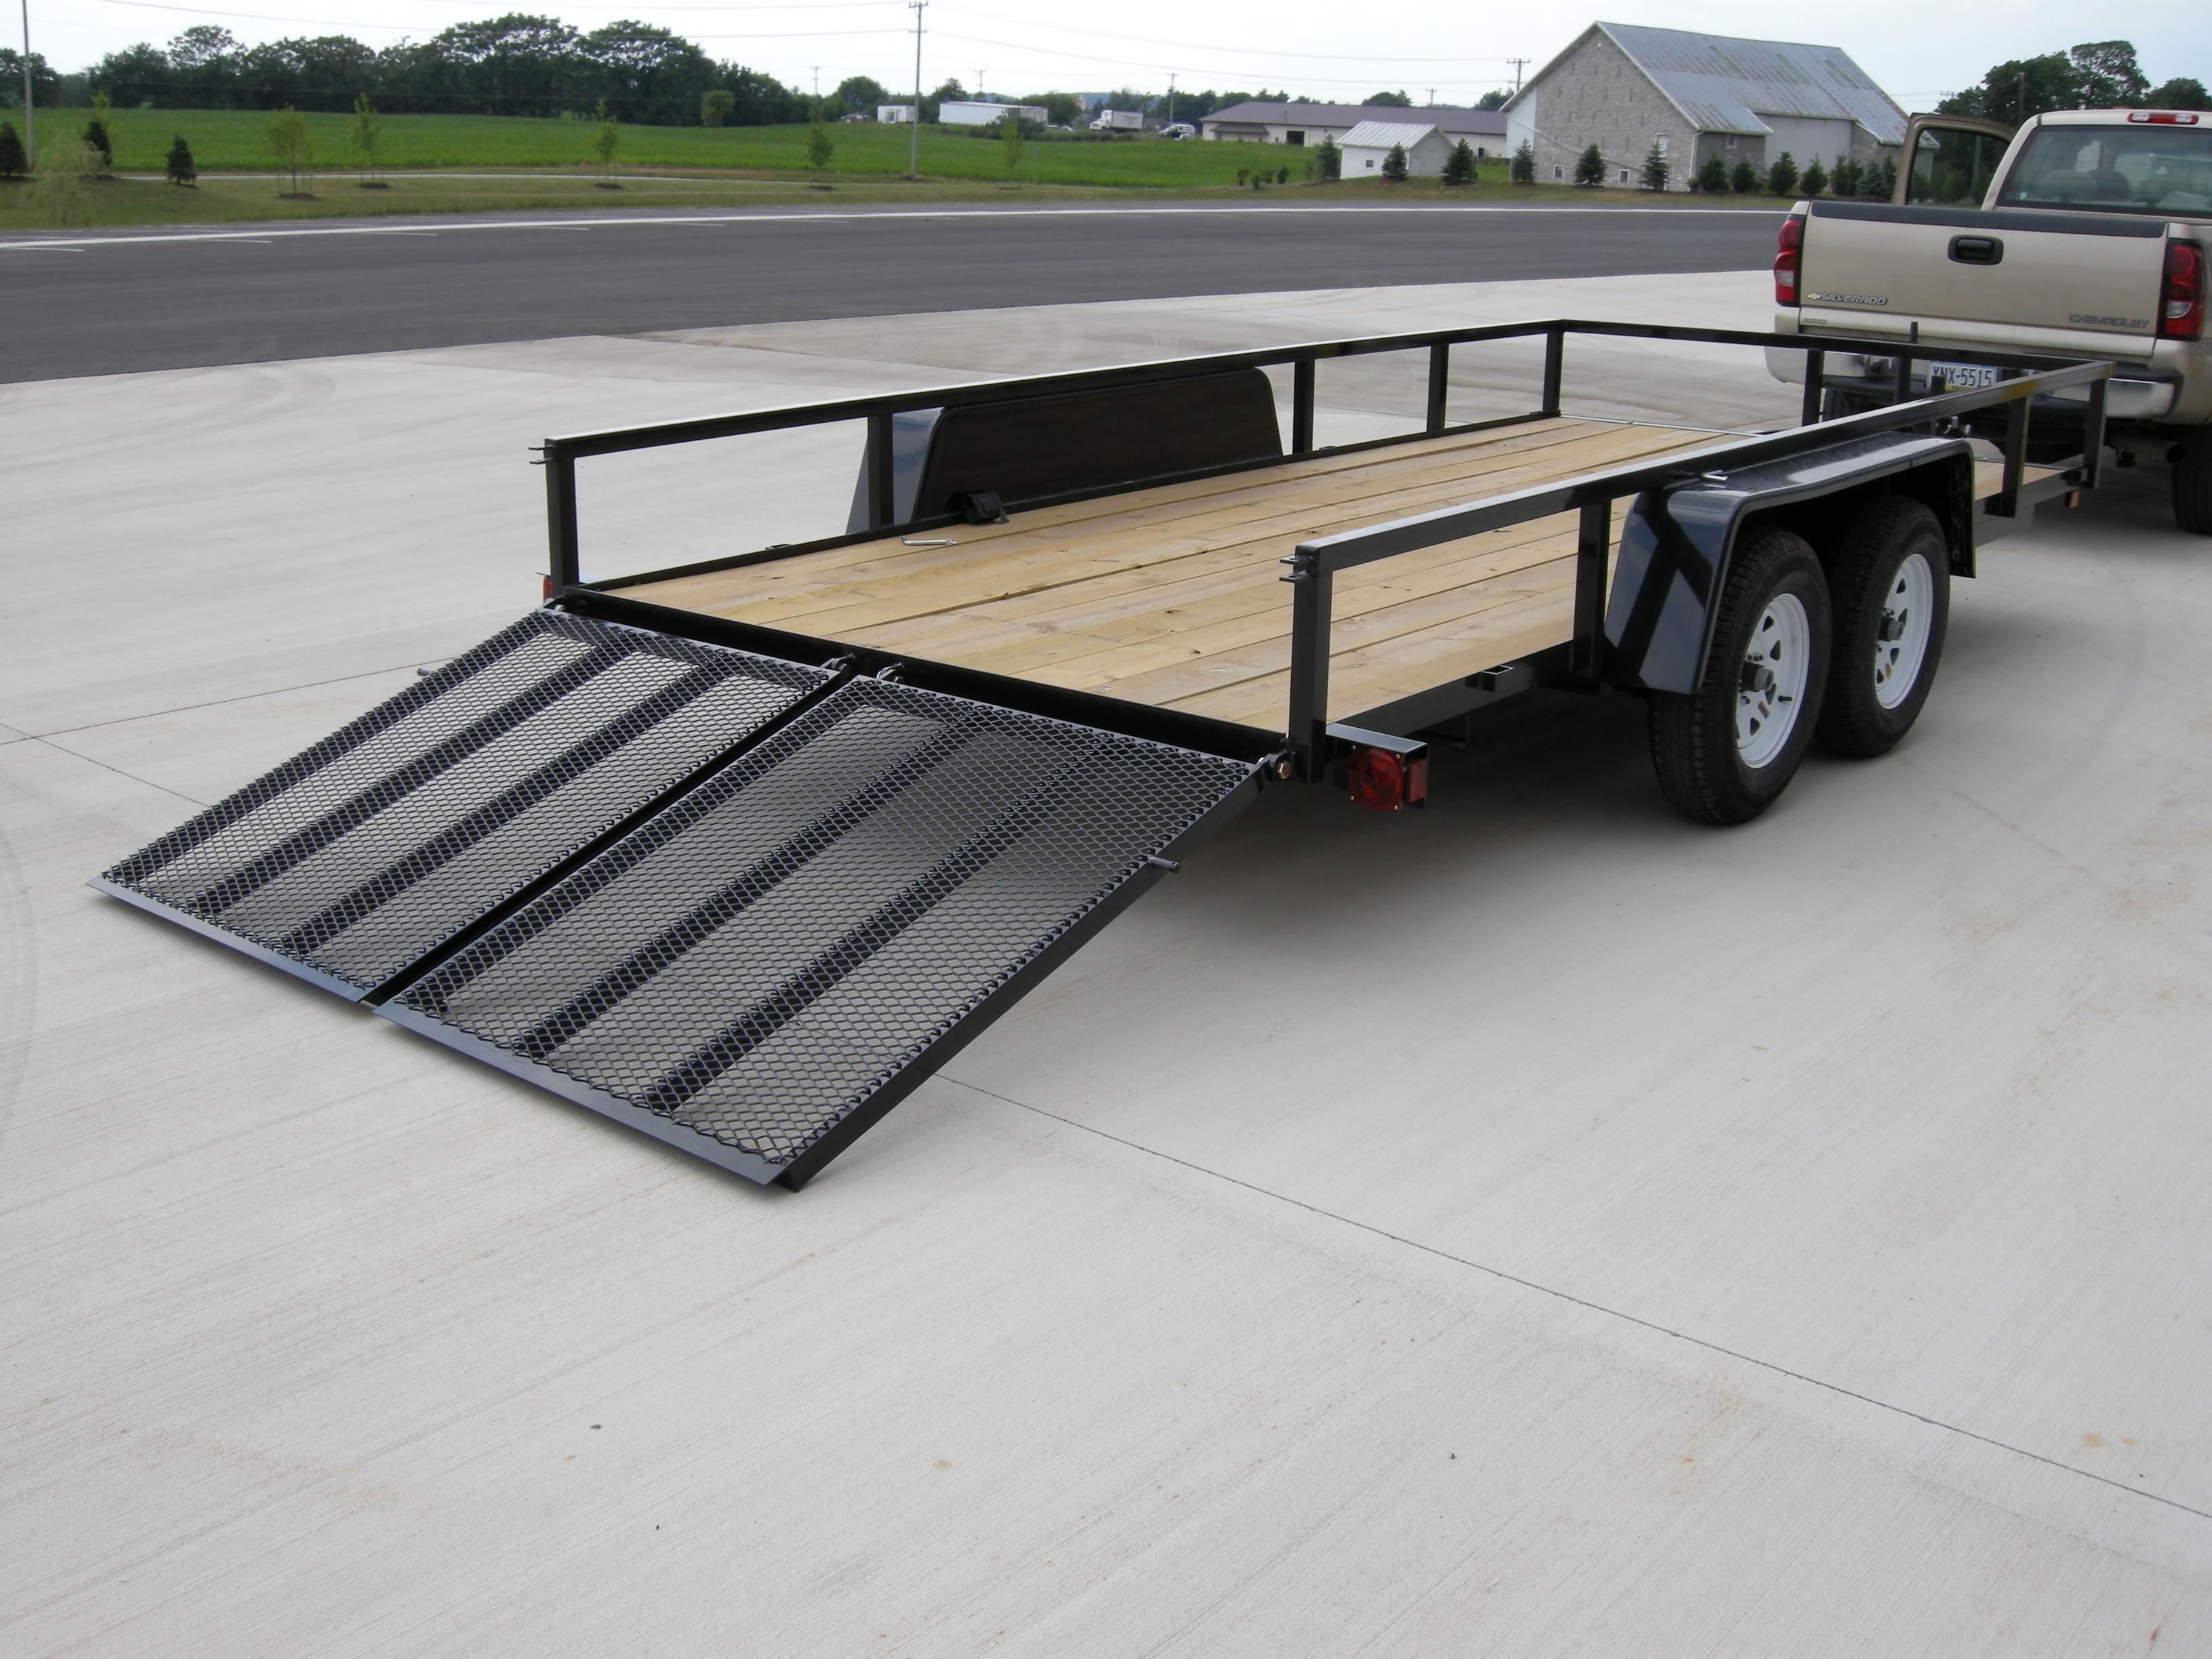 bri mar unveils new utility trailer line. Black Bedroom Furniture Sets. Home Design Ideas